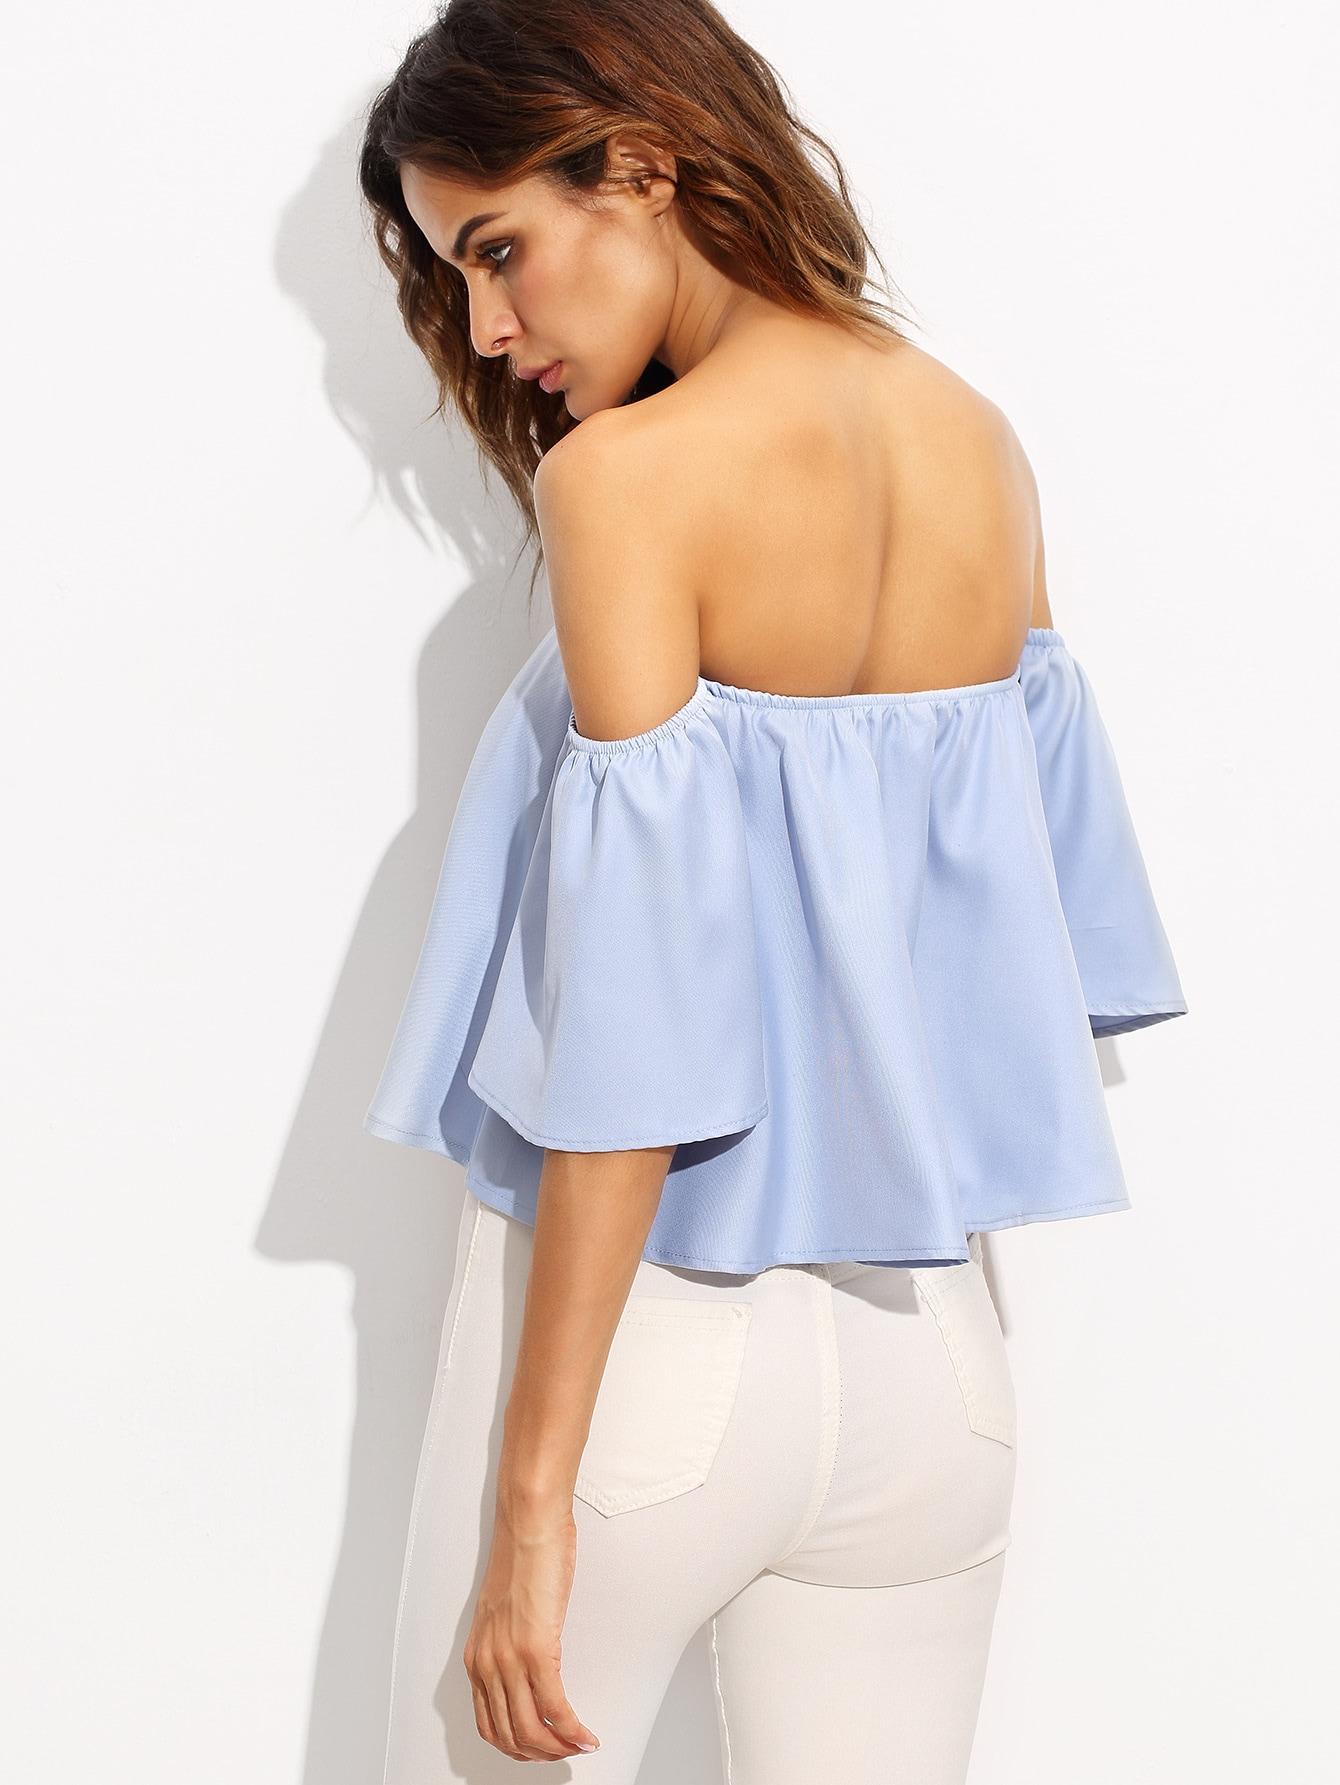 blouse160804102_2